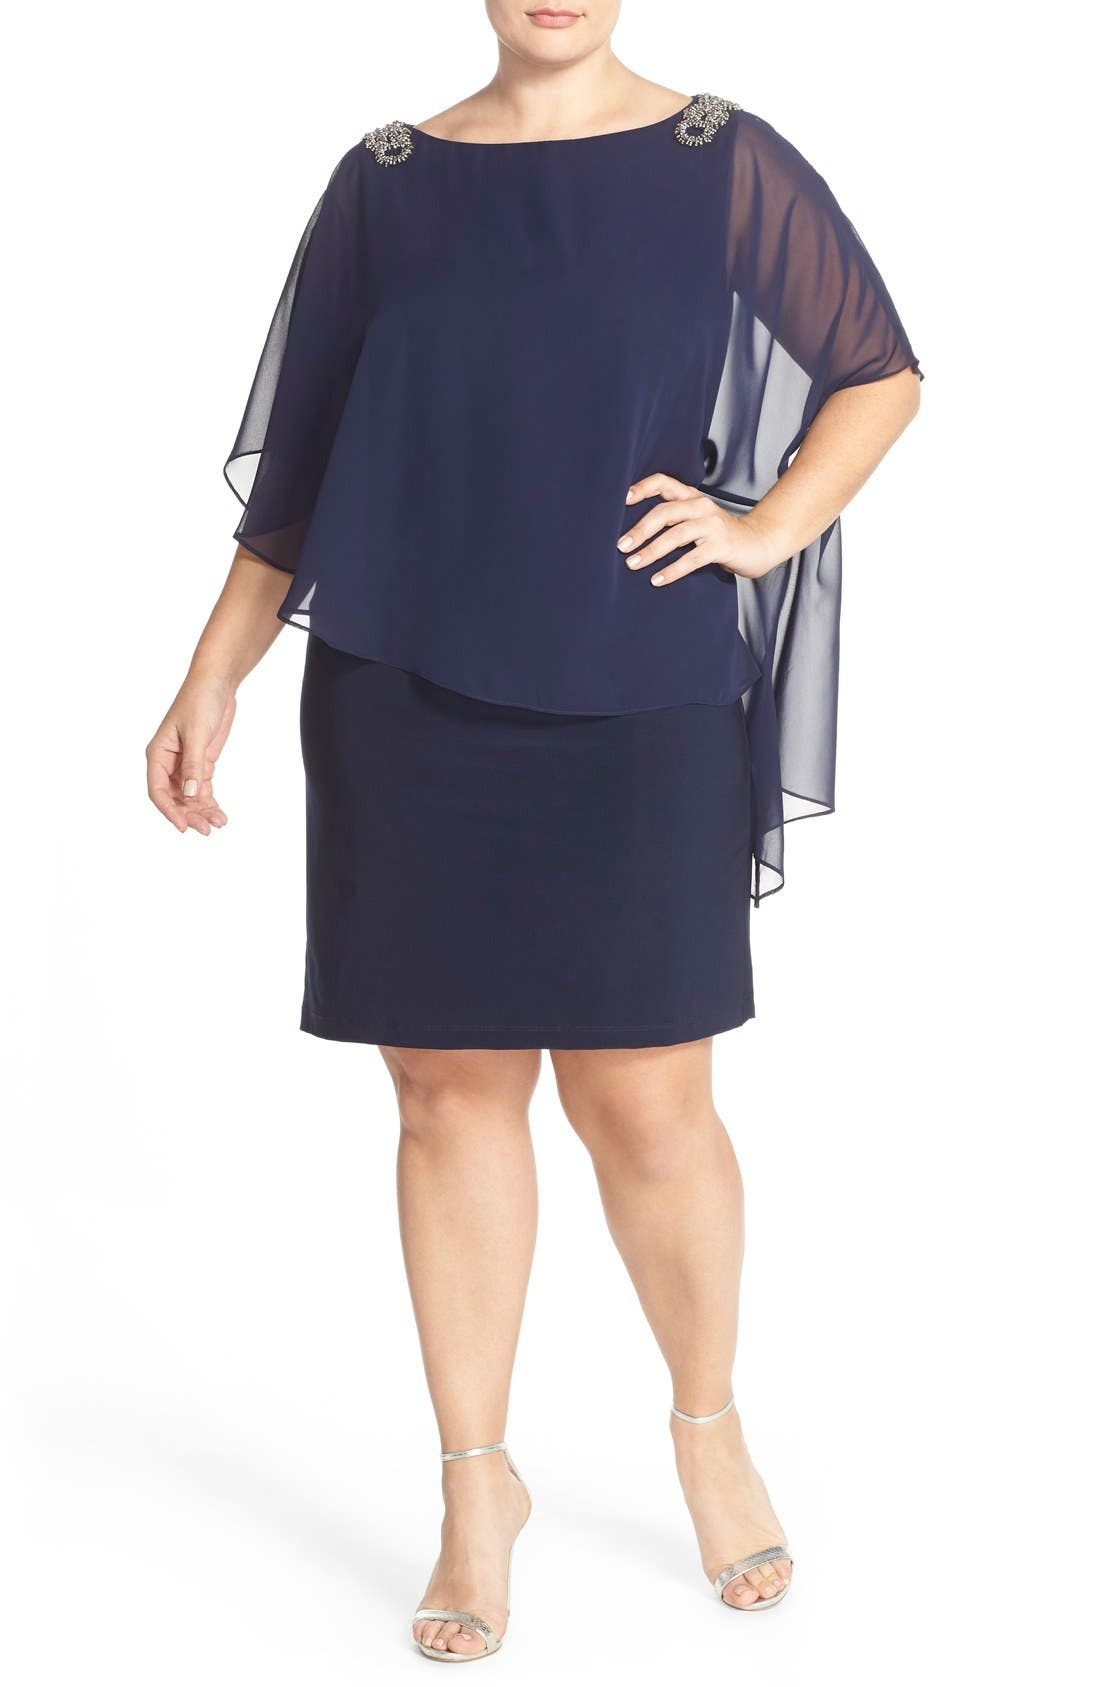 Main Image - Xscape Embellished Chiffon Overlay Jersey Dress (Plus Size)